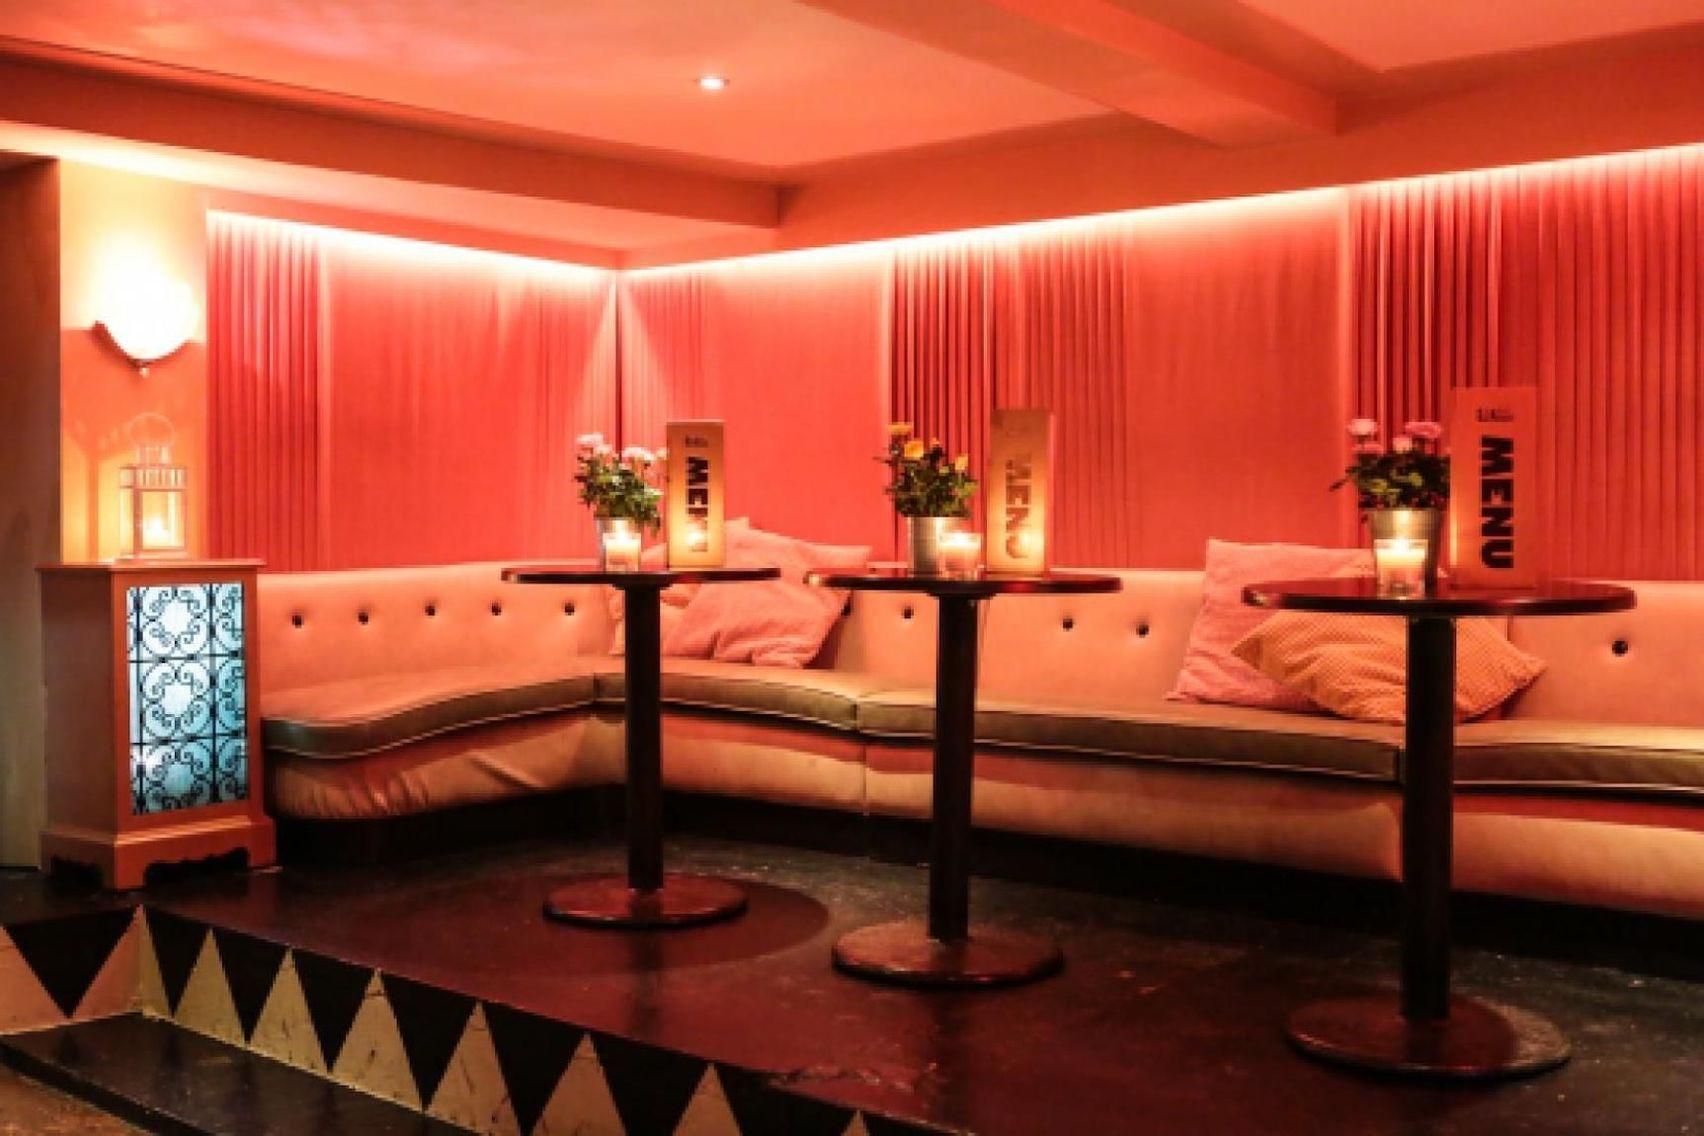 Book the deco lounge big chill house london u headbox